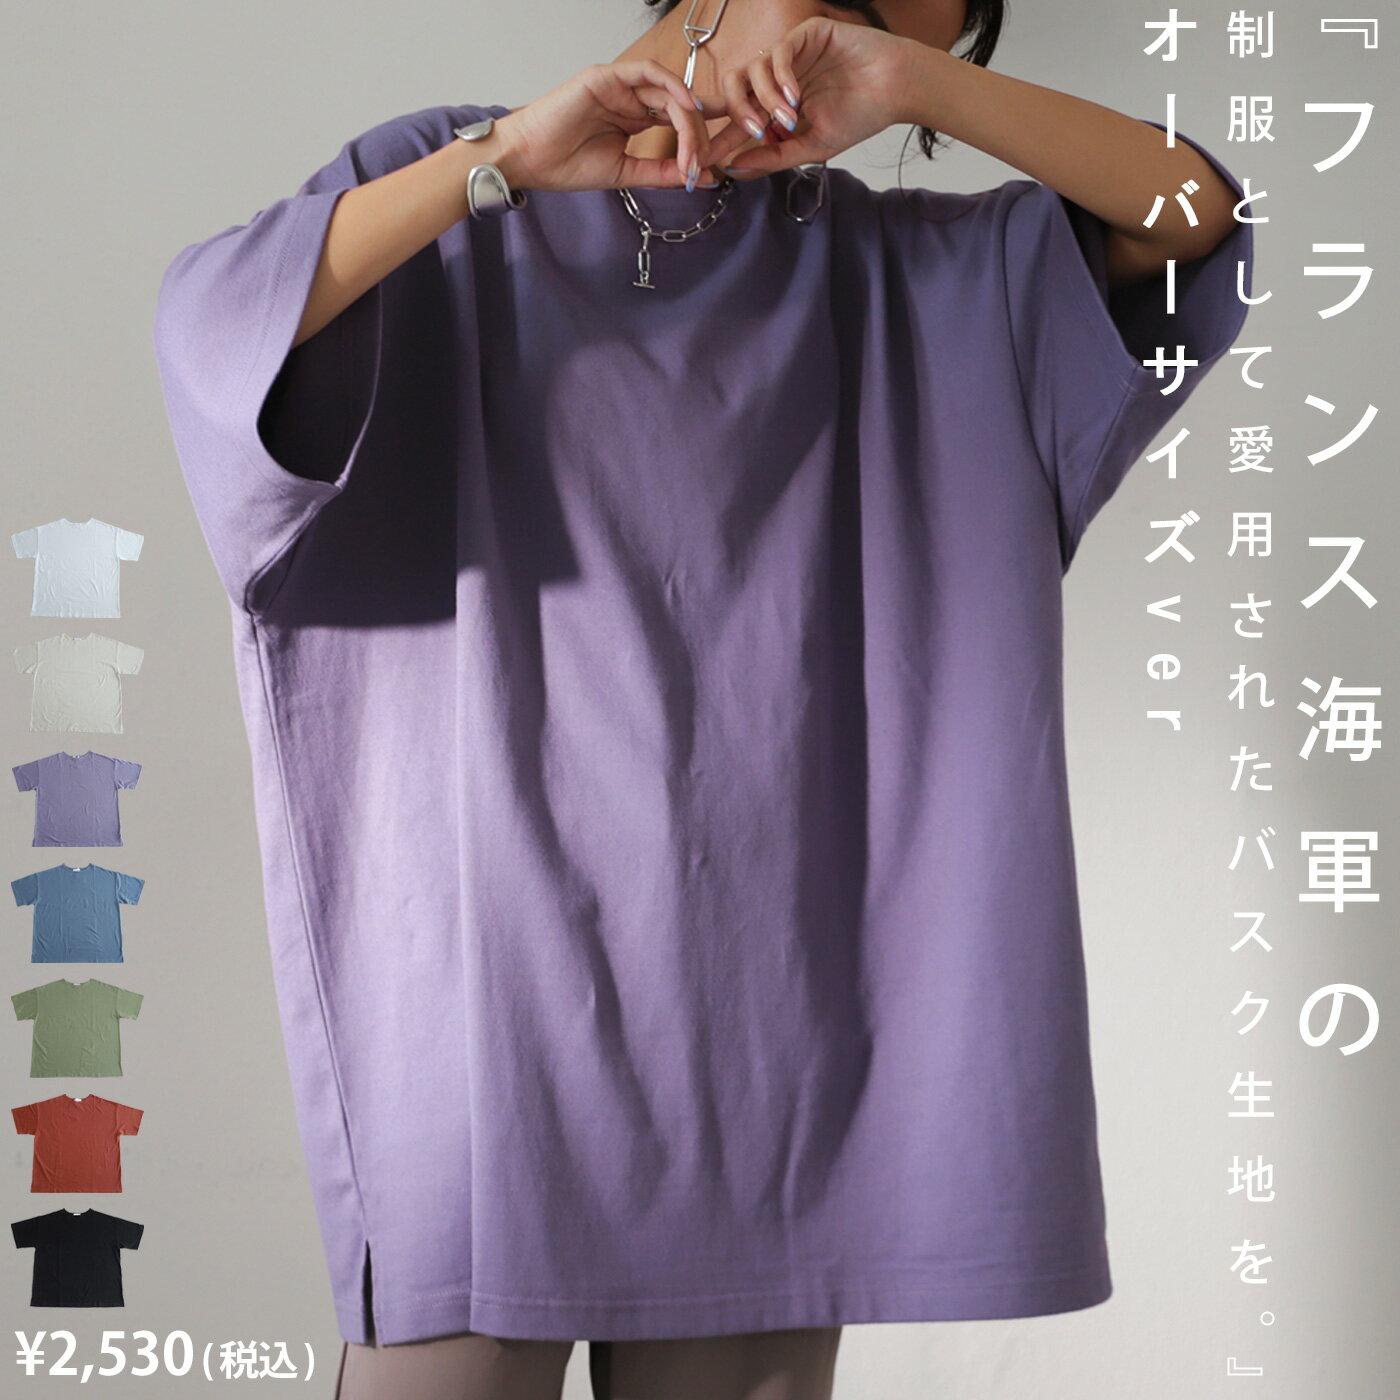 Tシャツ レディース 半袖 ビッグシルエット バスクT 綿・再販。メール便不可